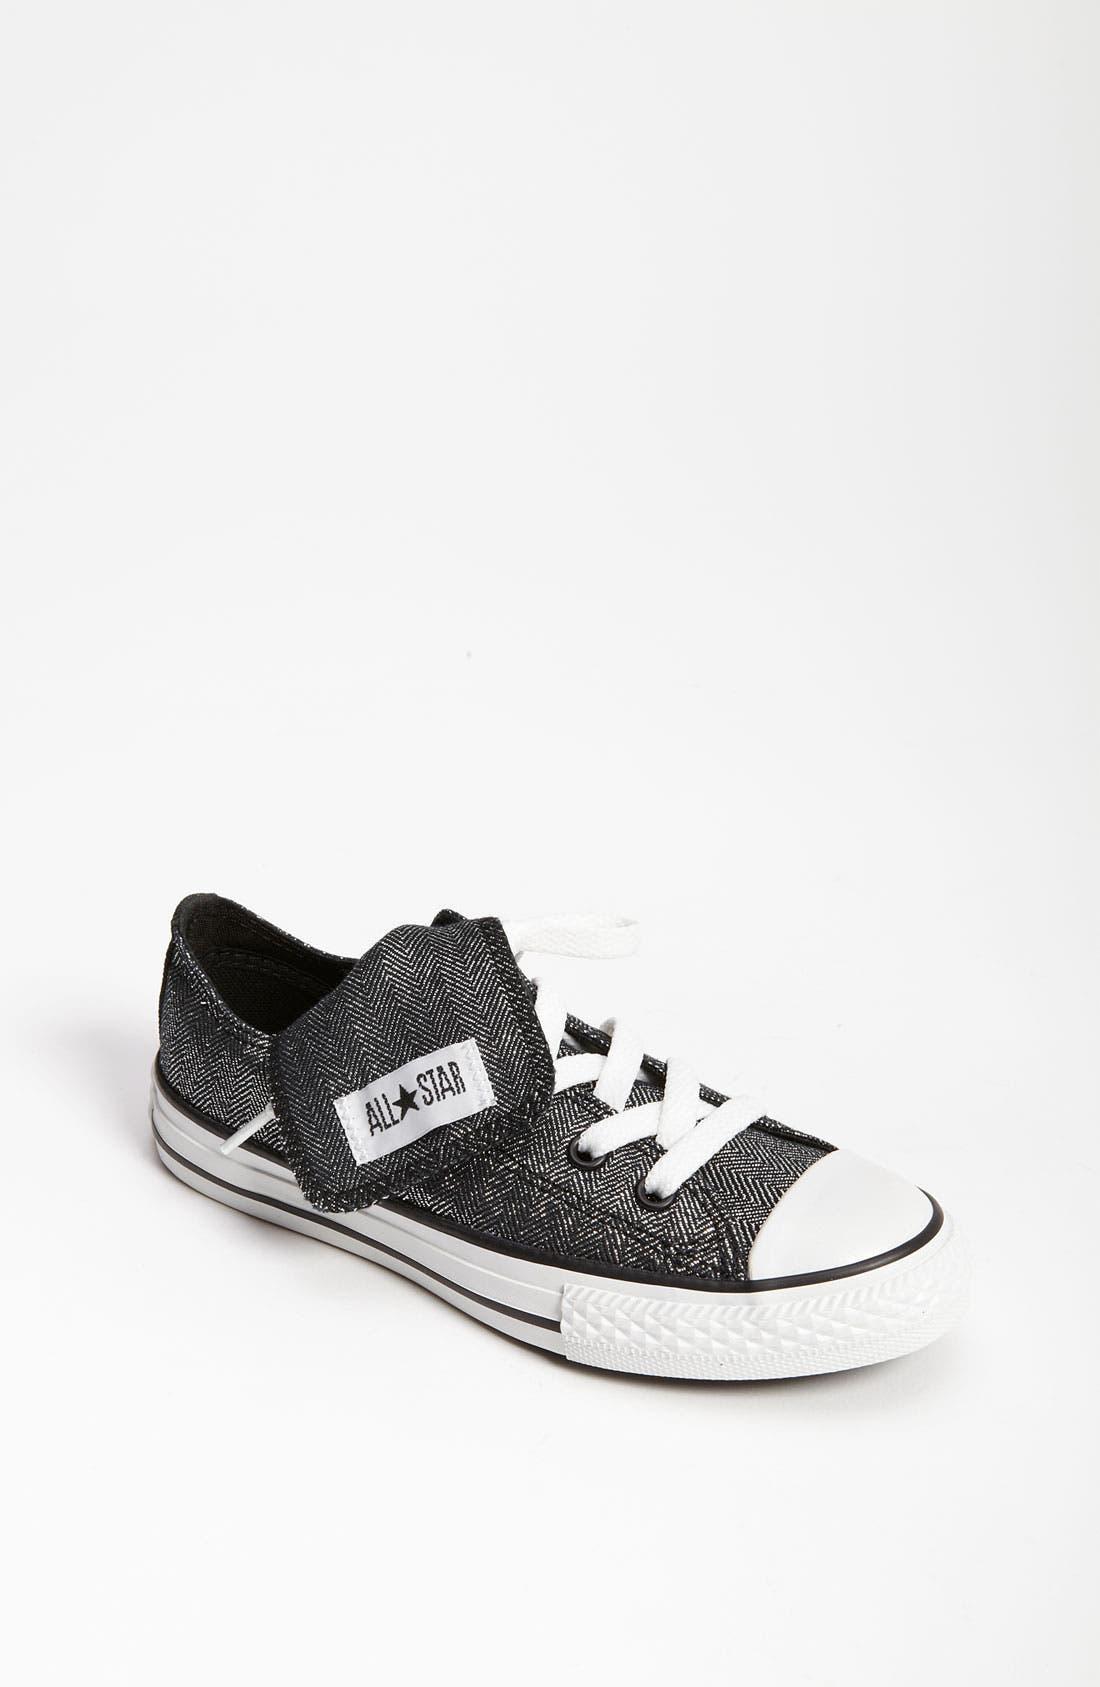 Alternate Image 1 Selected - Converse 'Sparkle' Mega Tongue Sneaker (Toddler, Little Kid & Big Kid)